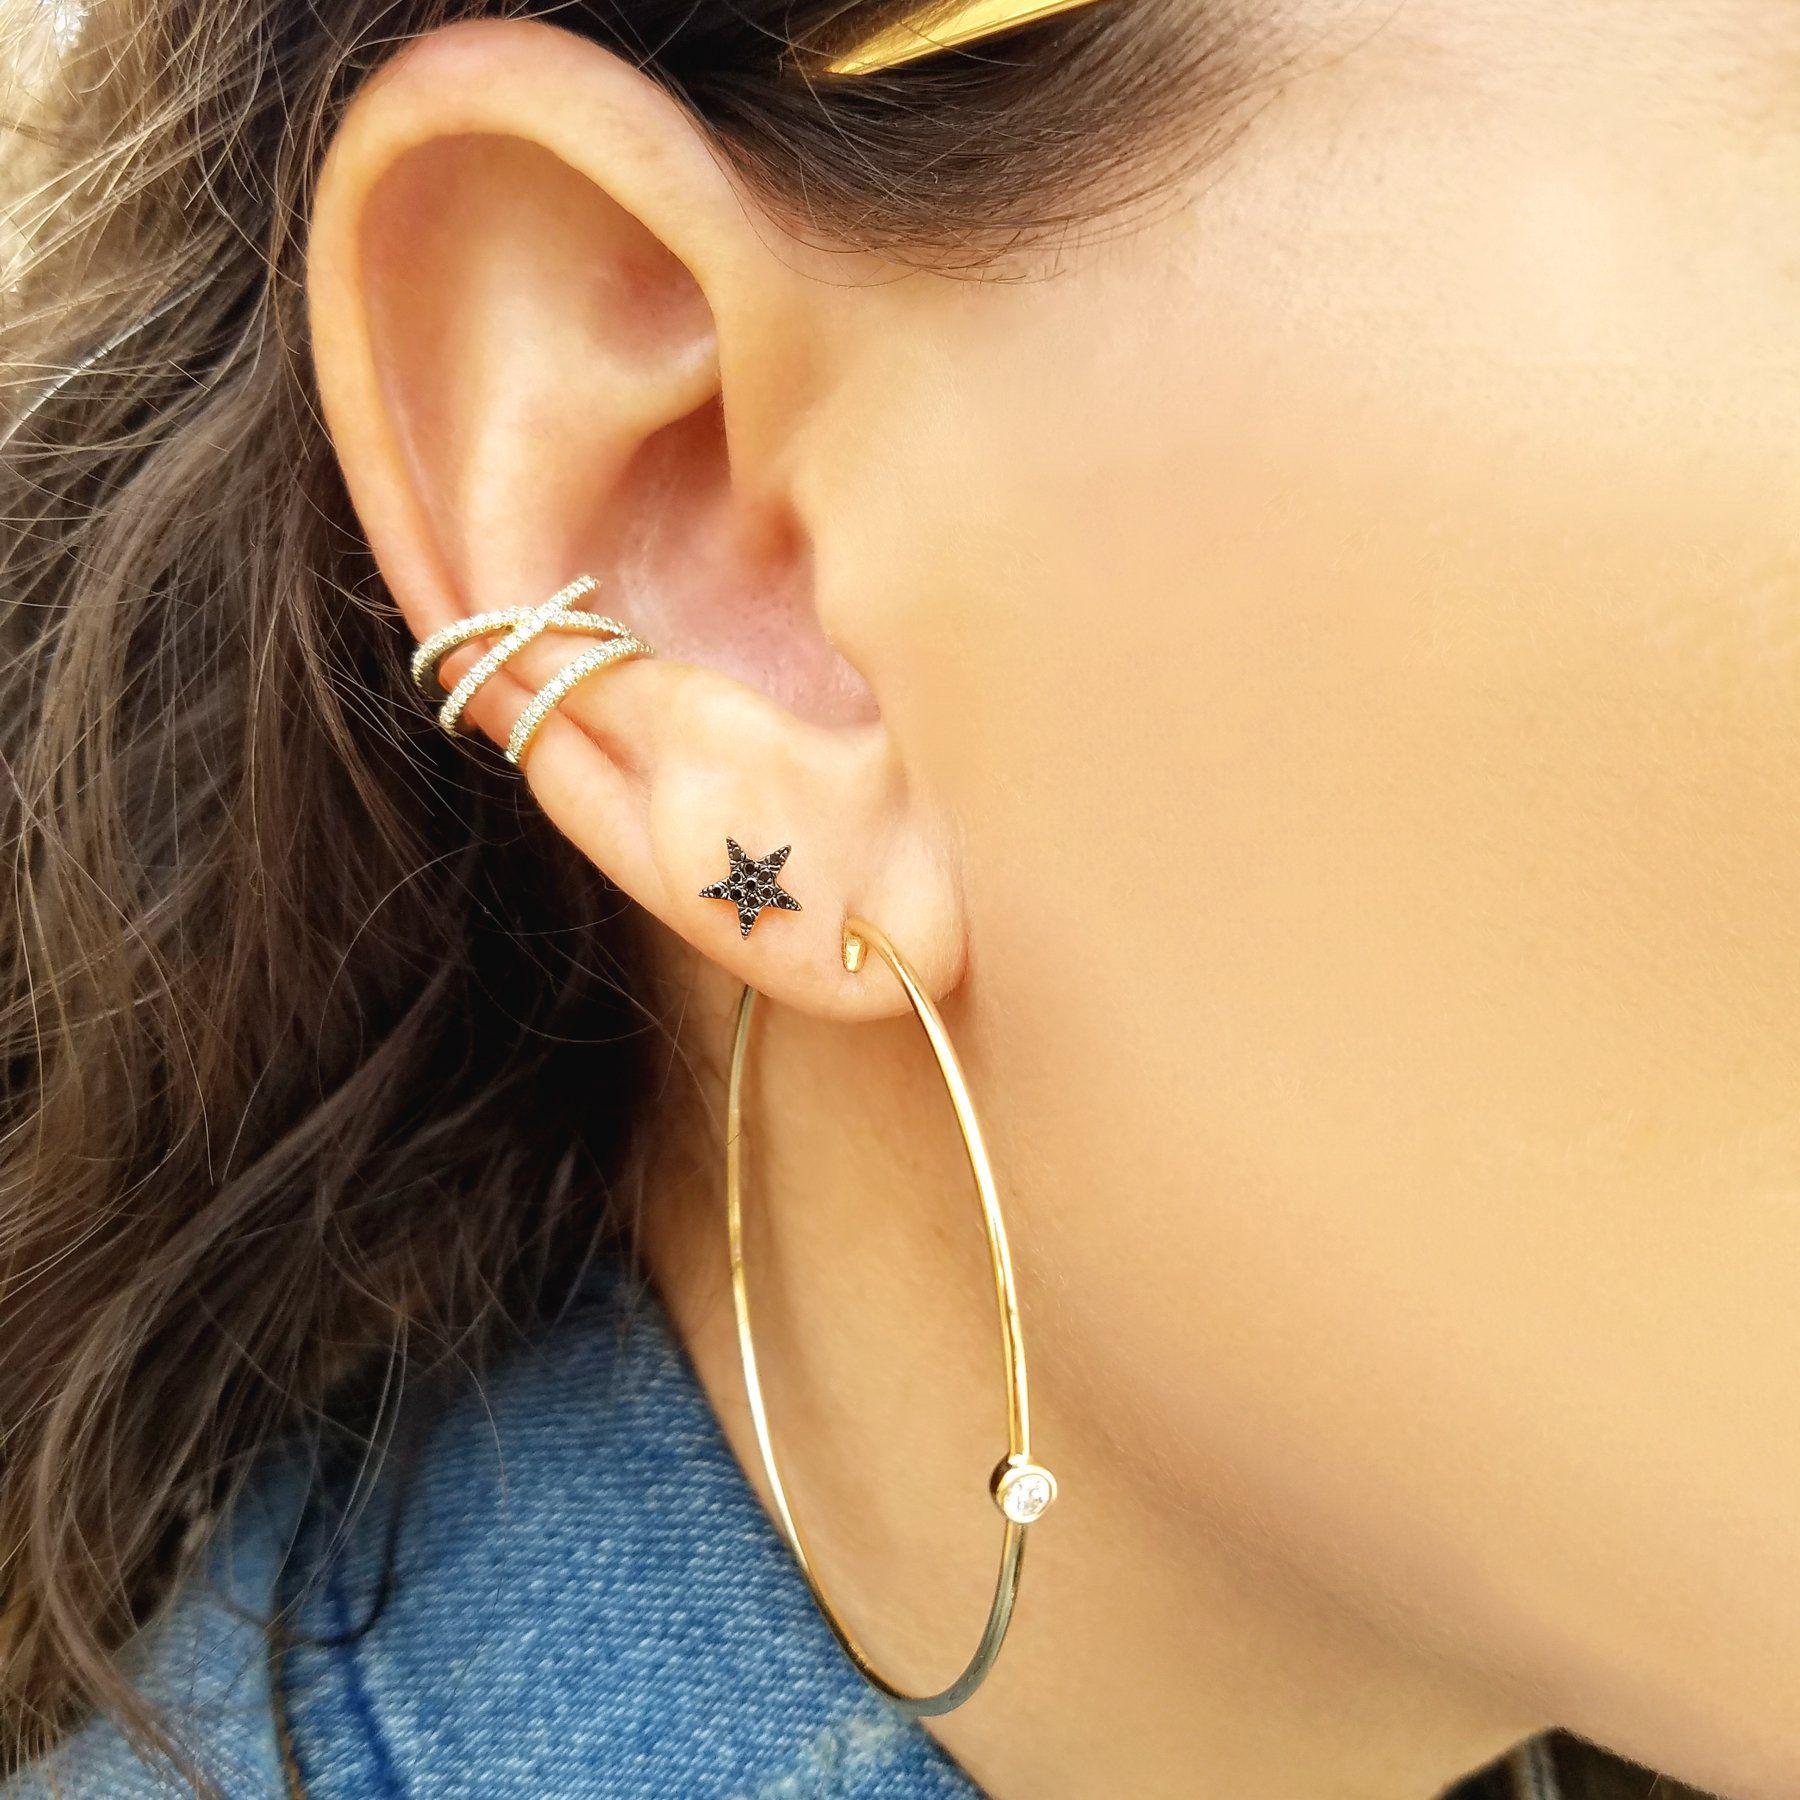 Yellow nose piercing  Elegant K Gold Hoop Earrings featuring a single brilliant diamond